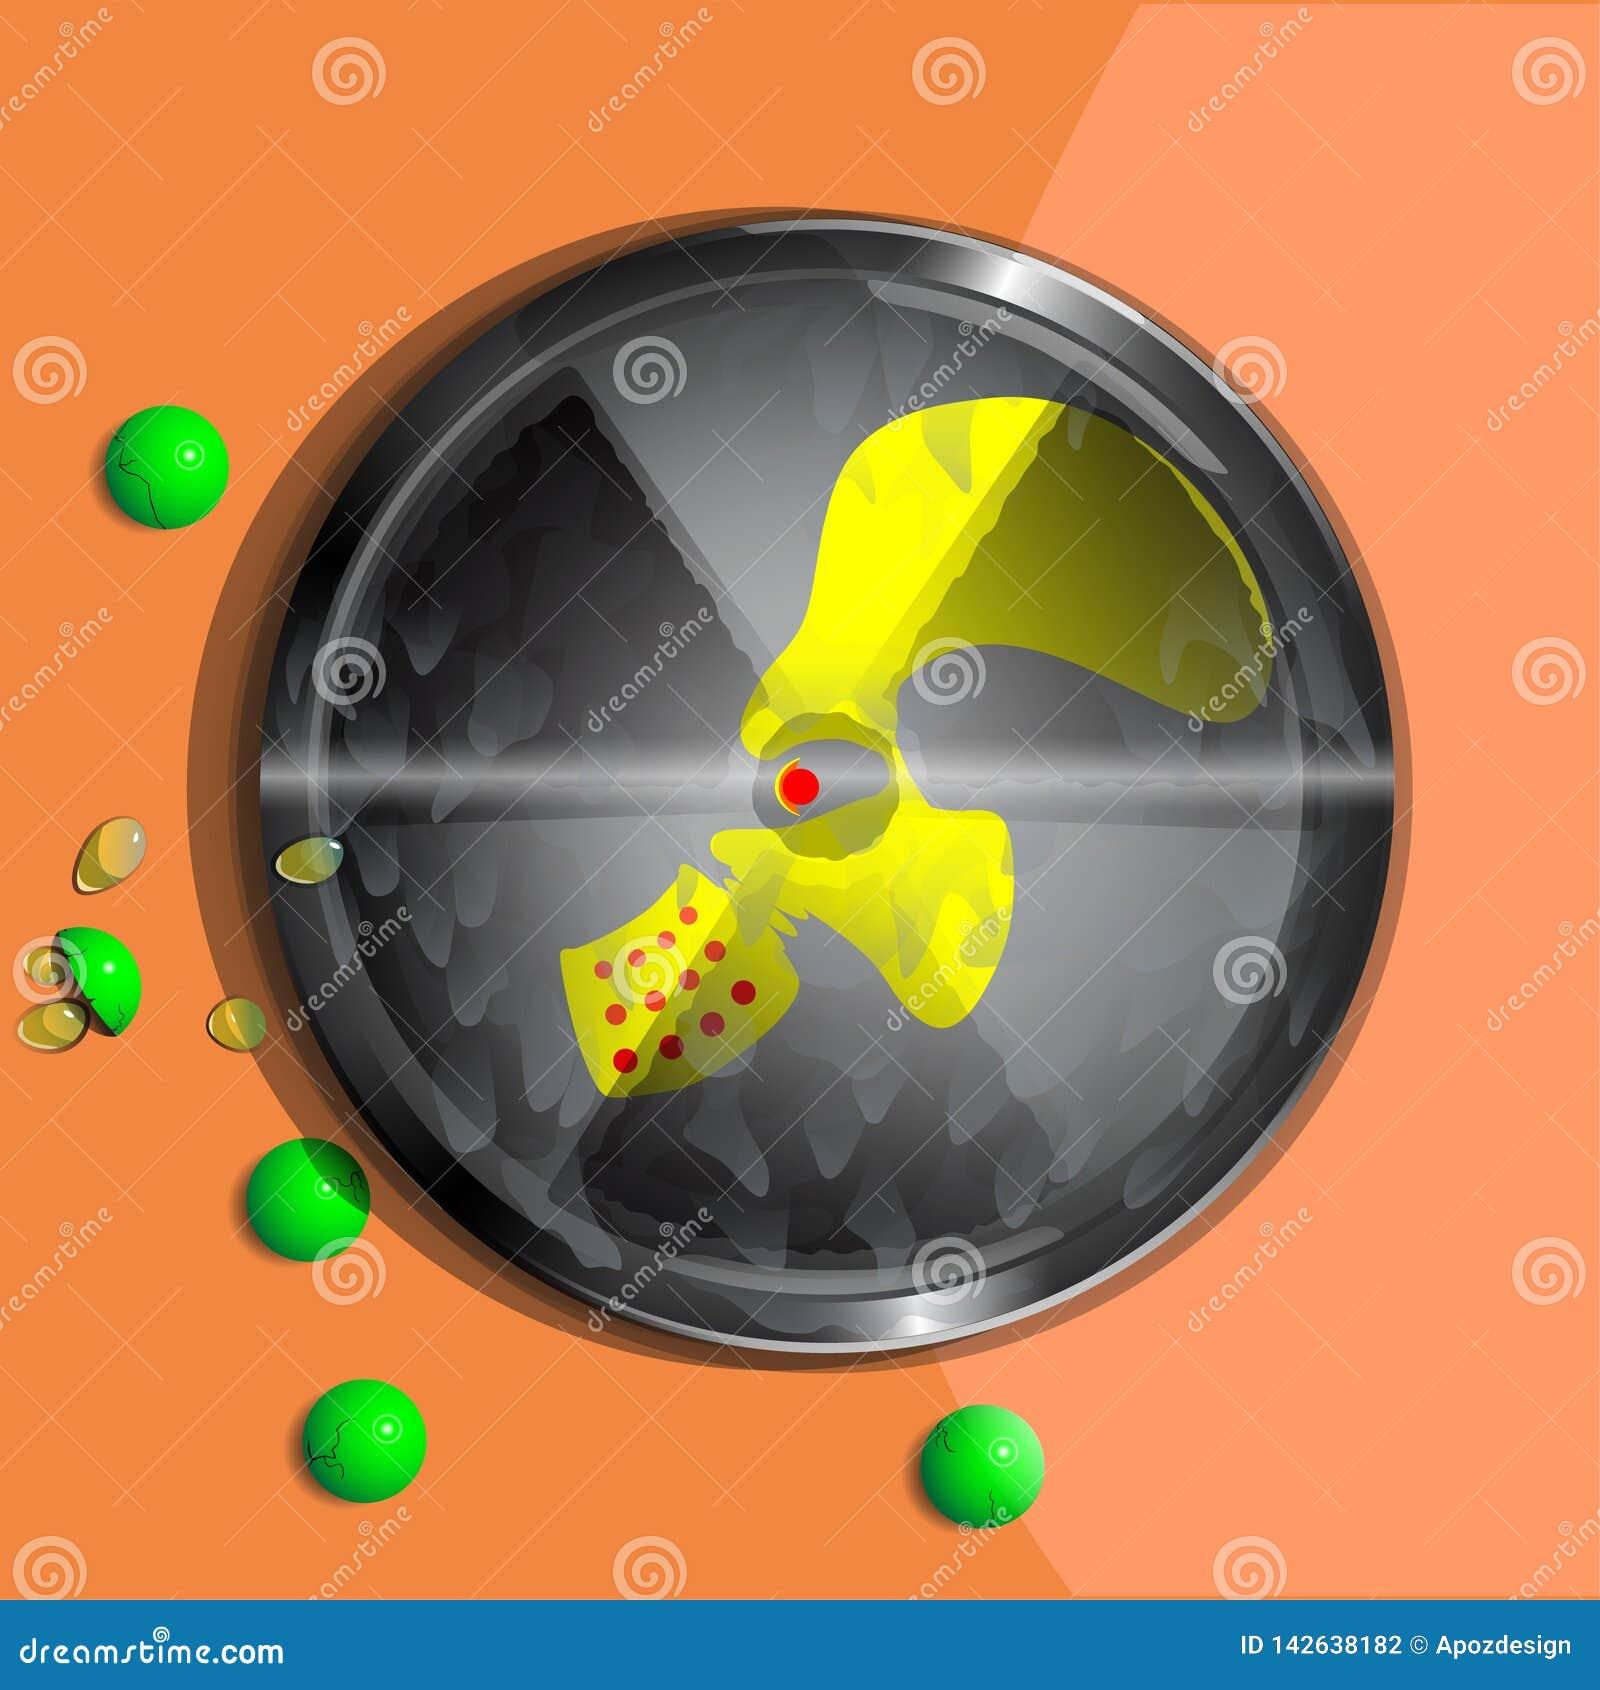 Radioactive contamination symbol